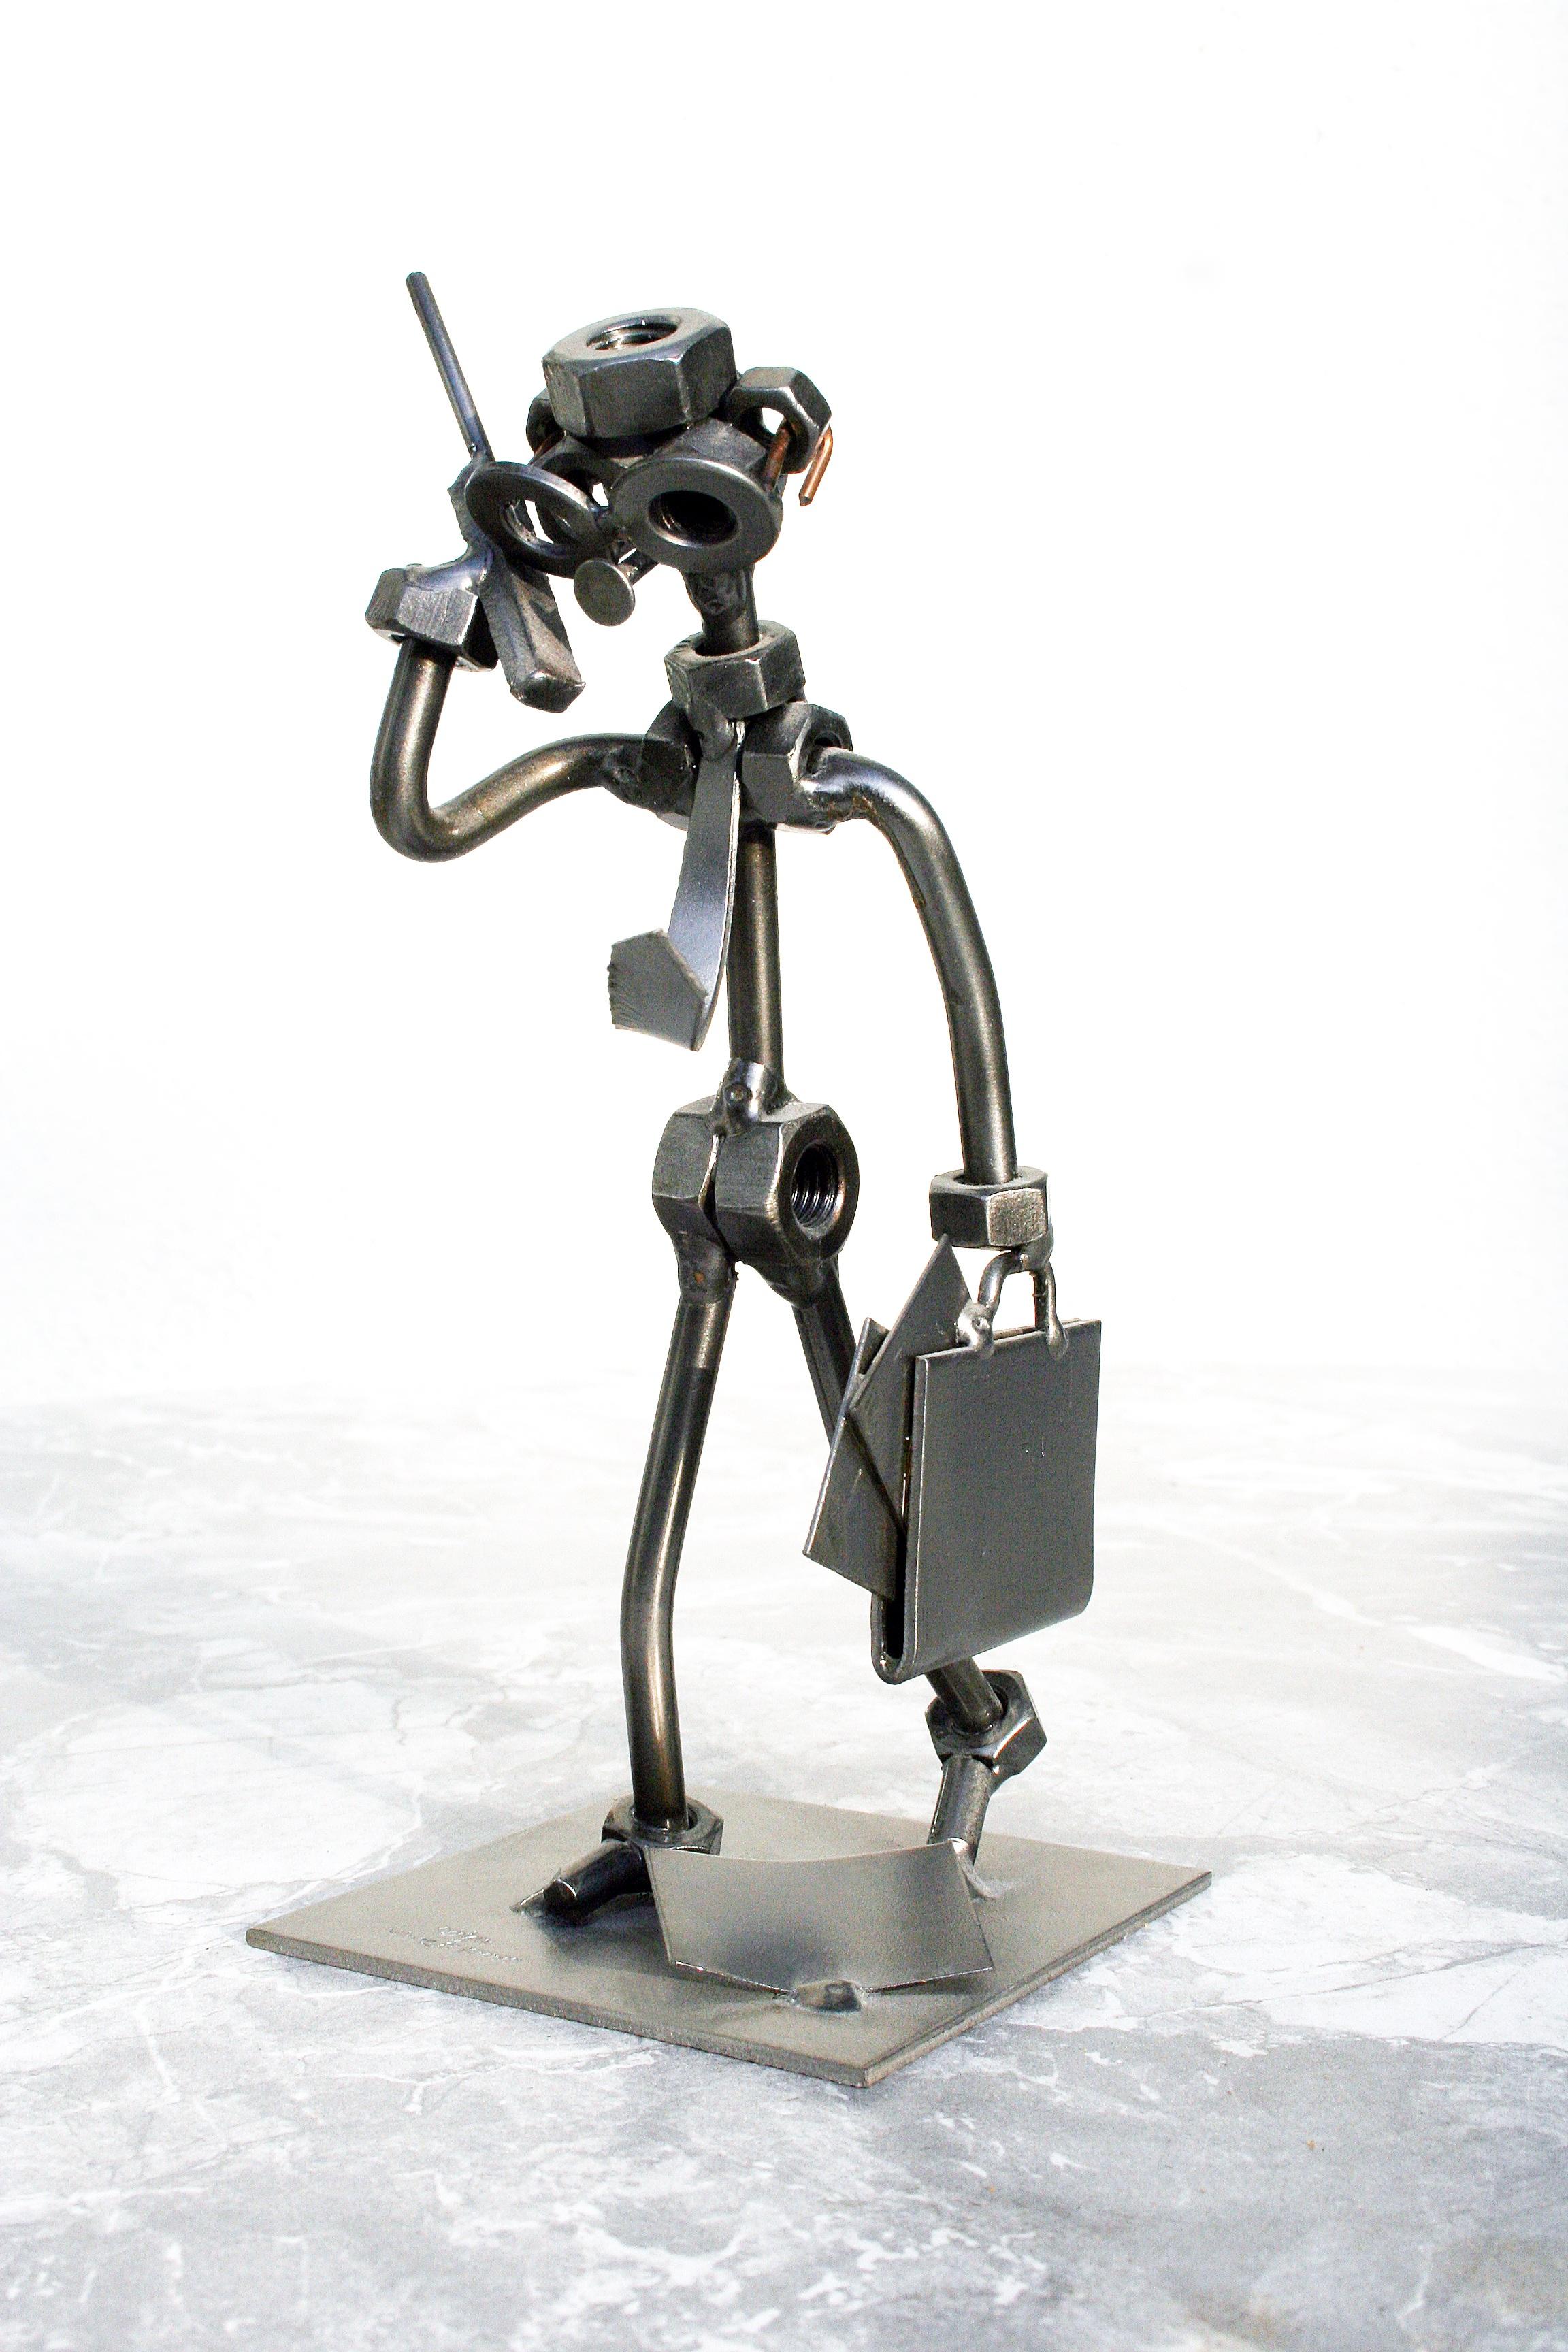 Gambar Manusia Kawat Komunikasi Mesin Bisnis Mainan Telepon Koleksi Anak Genggam Patung Arca Robot Action Figure